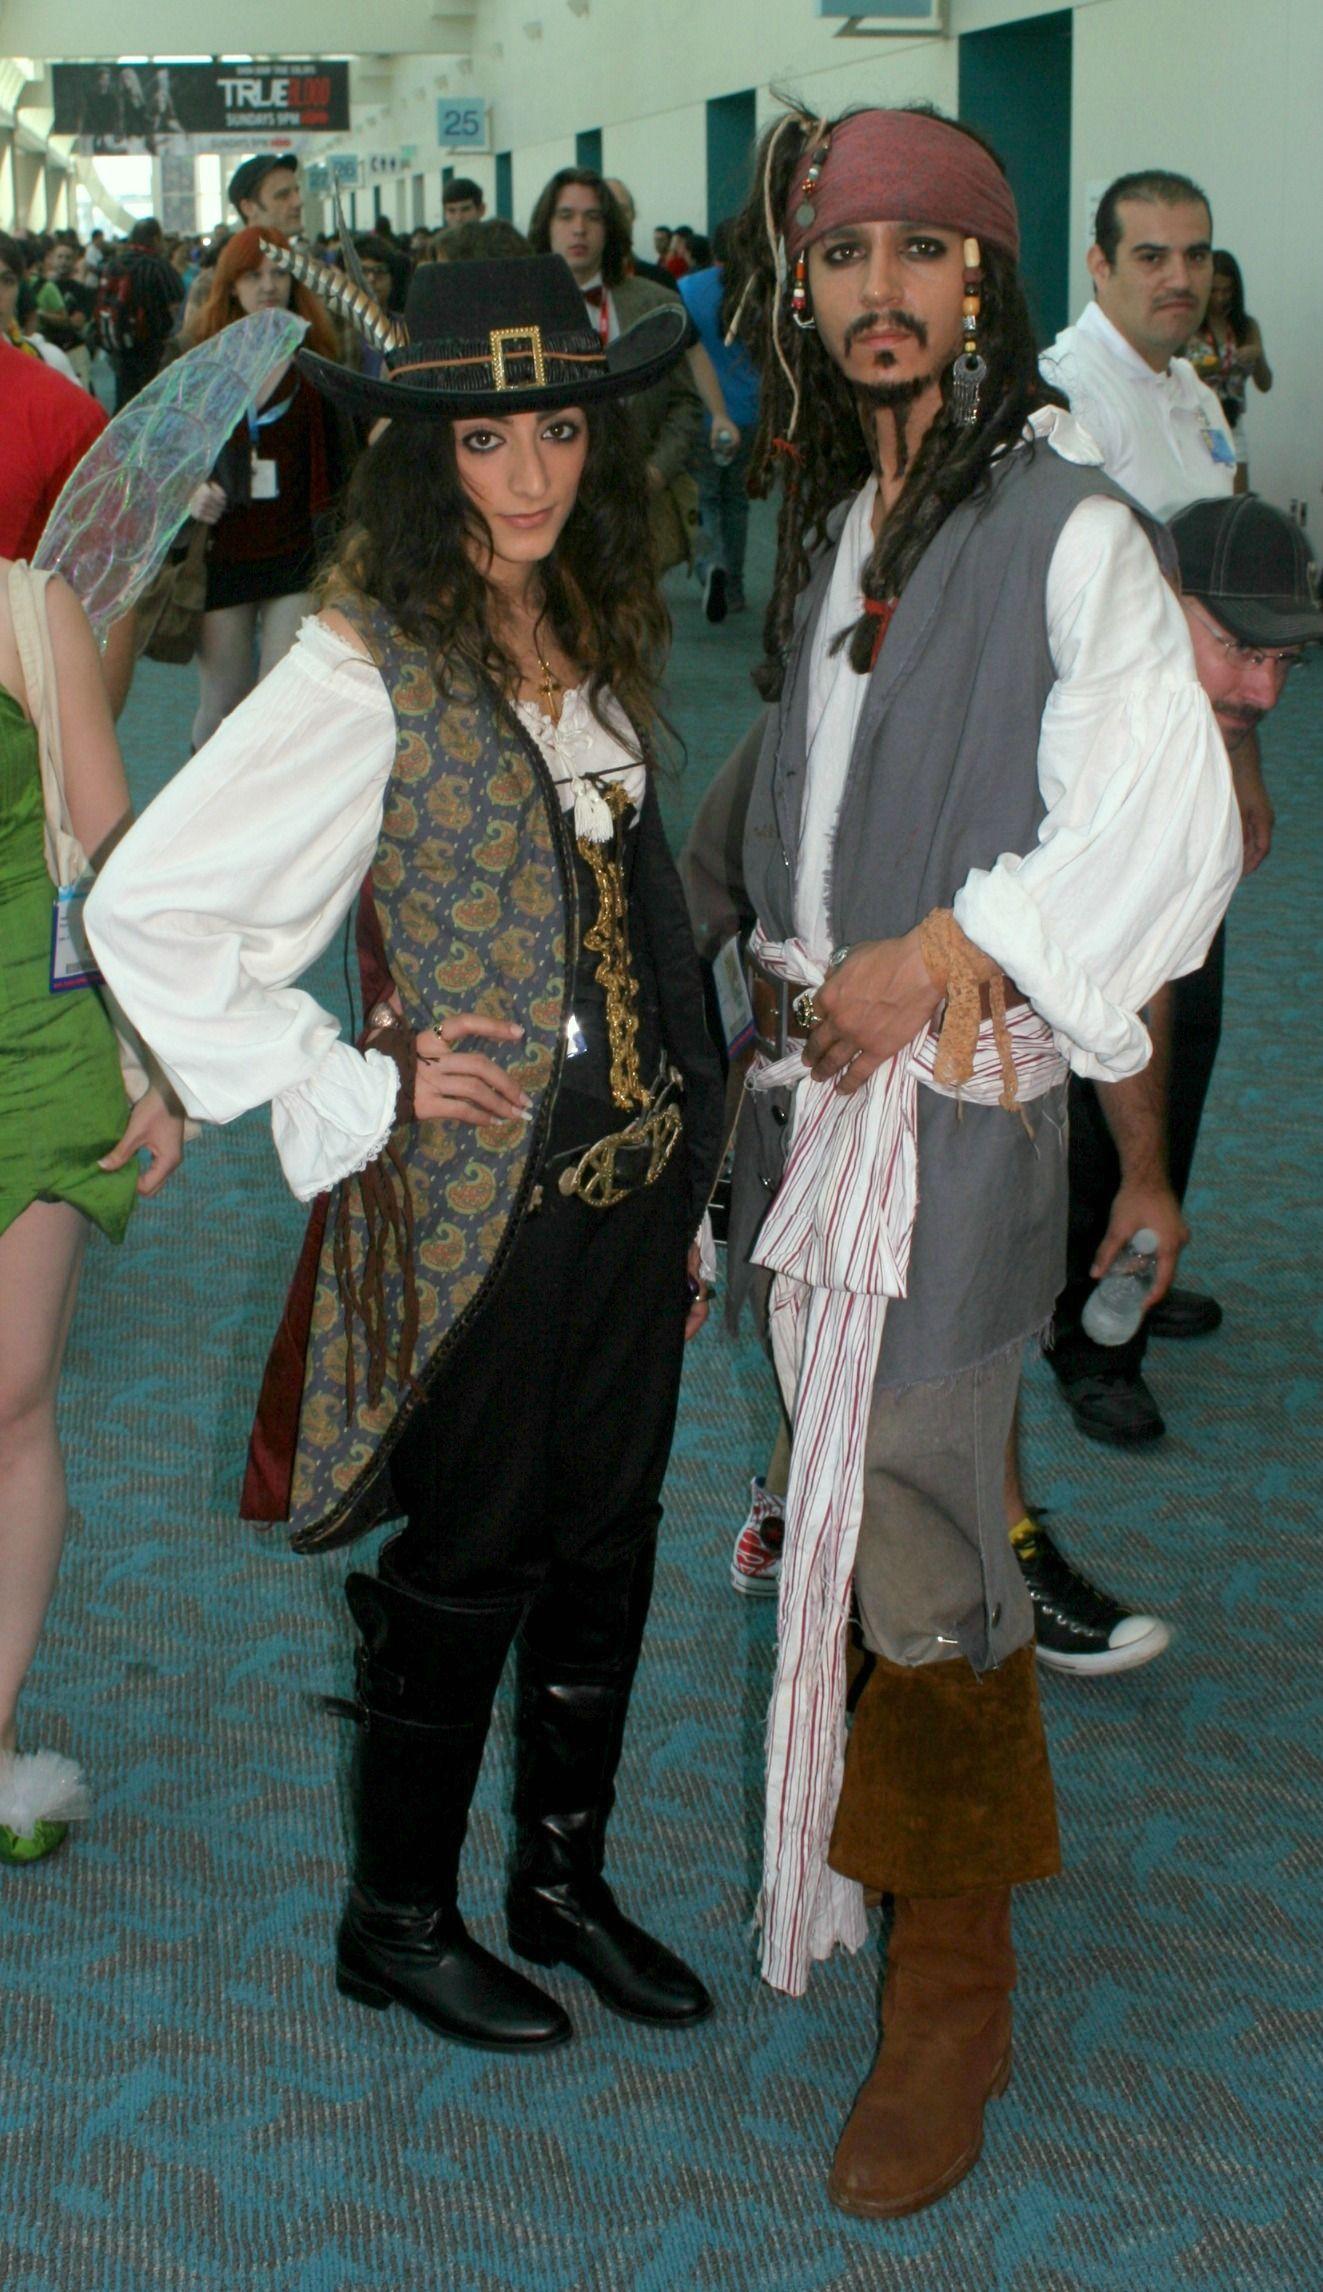 Déguisement Elizabeth Swann Pirates of the Carribean Halloween Costume 4-6X NOUVEAU!!!